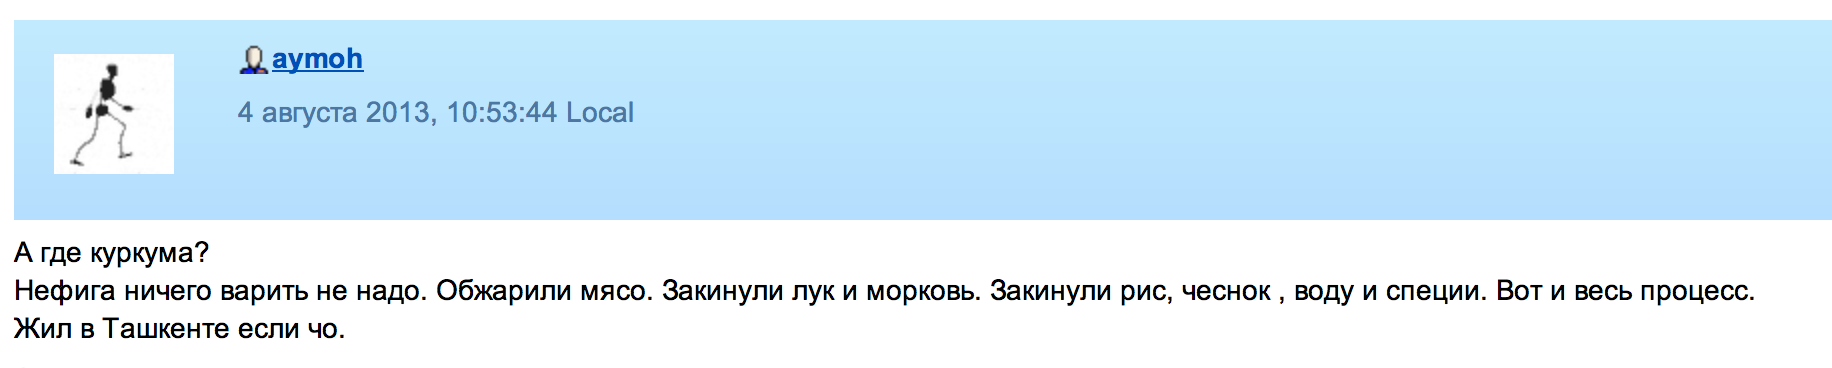 Снимок экрана 2013-08-04 в 12.09.57